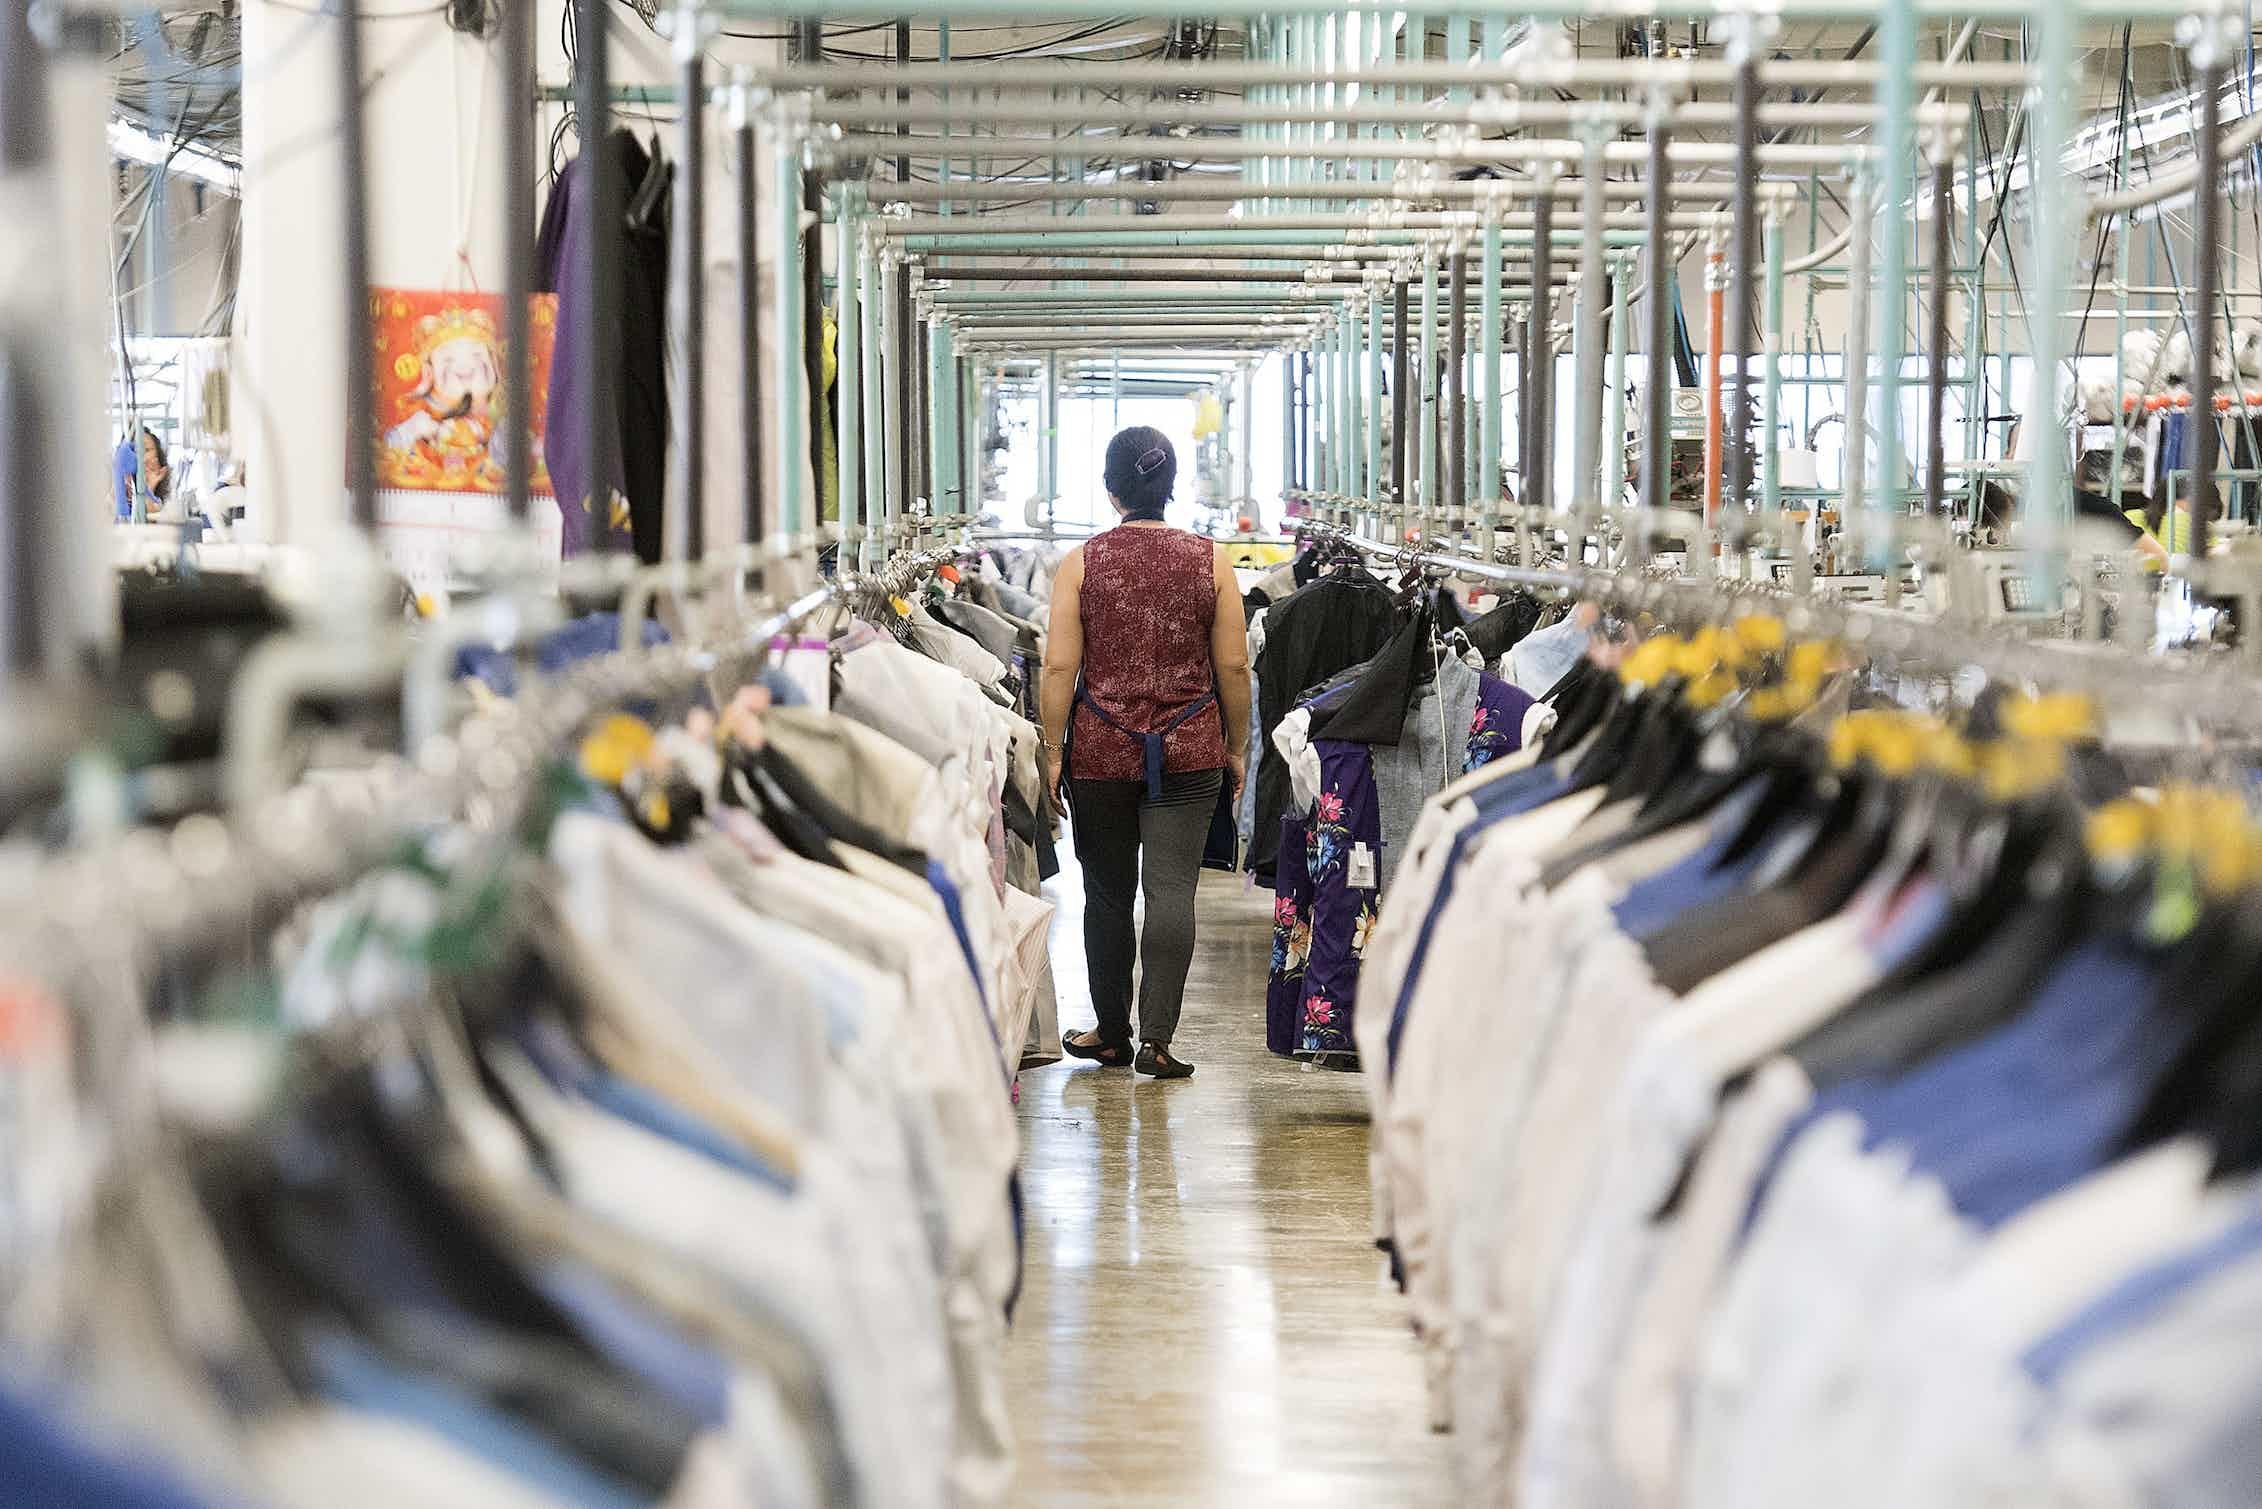 A garment worker walks through a clothing factory